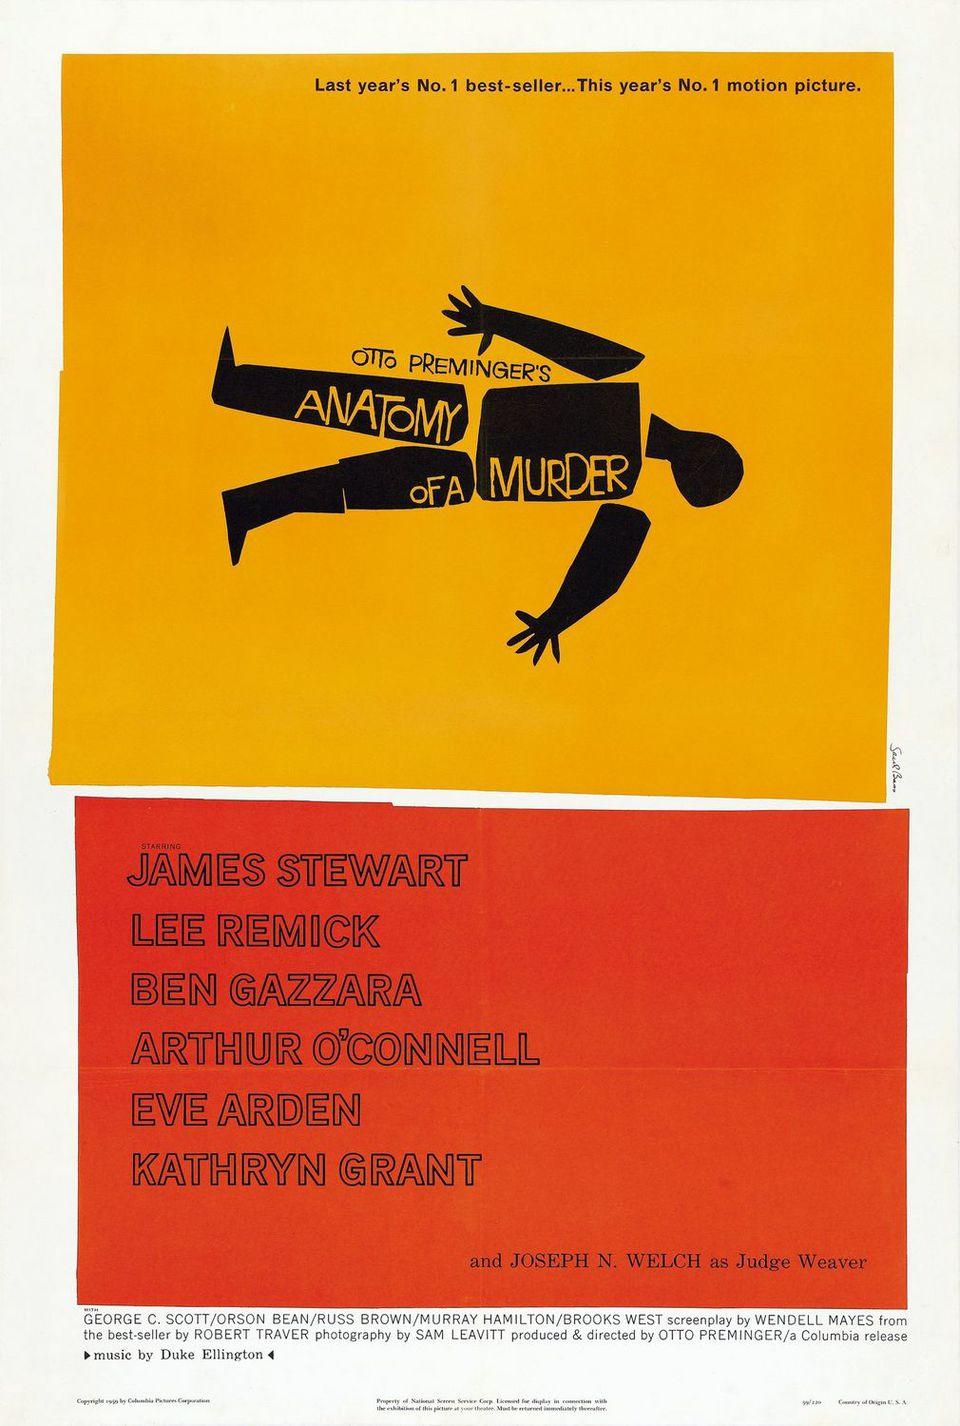 Estados Unidos poster for Anatomy of a Murder